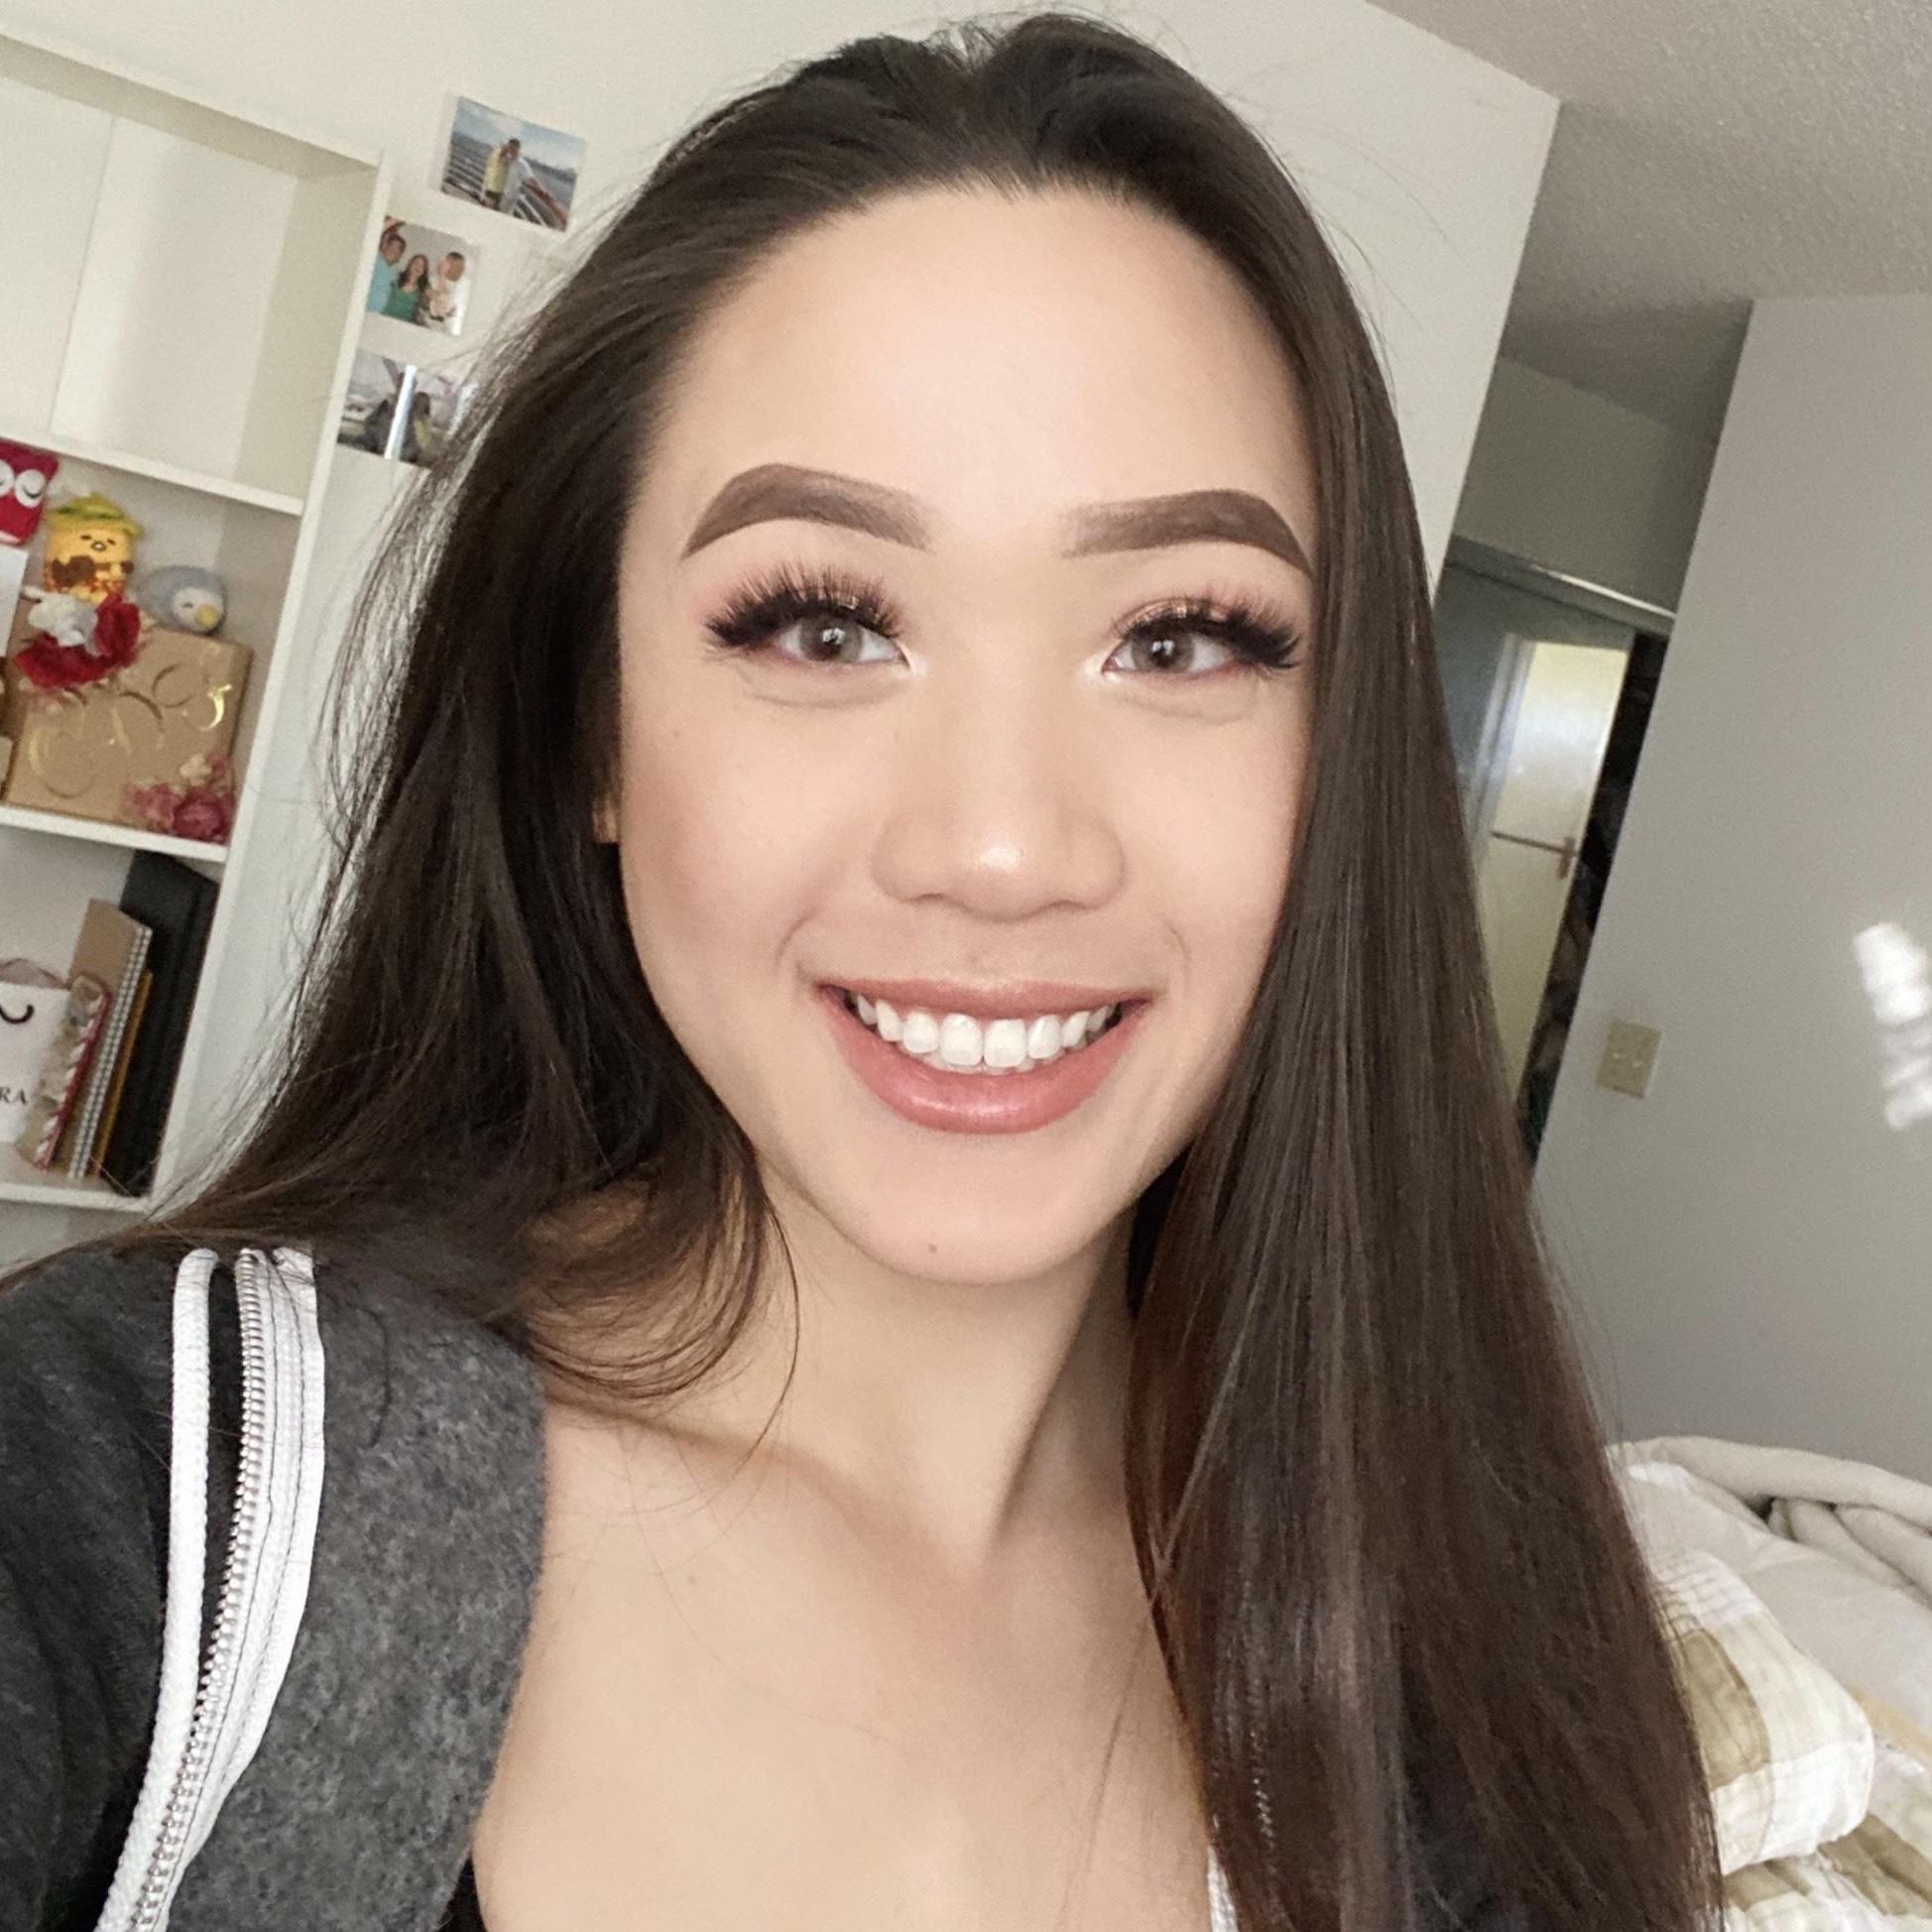 Cindy Vu from San Jose State University